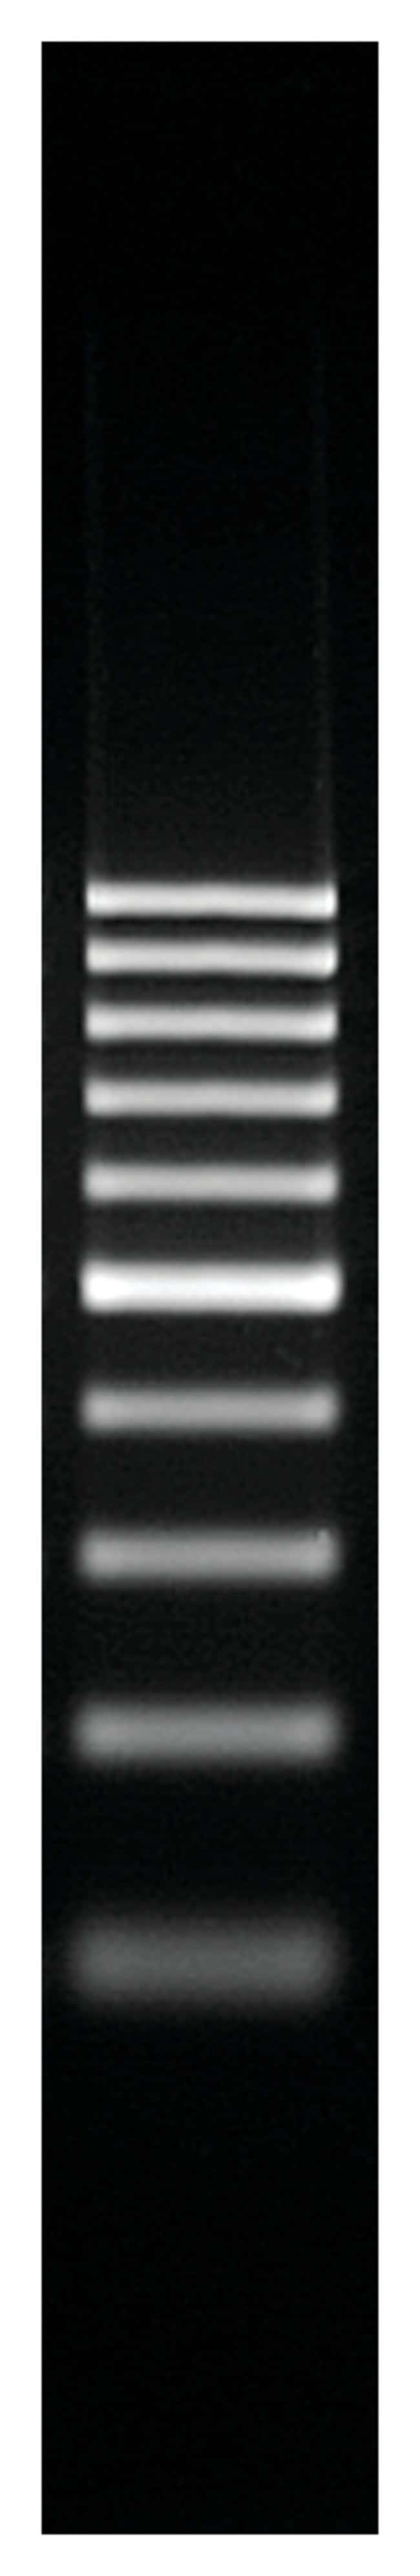 Thermo Scientific GeneRuler 100 bp DNA Ladder :Life Sciences:Biochemicals